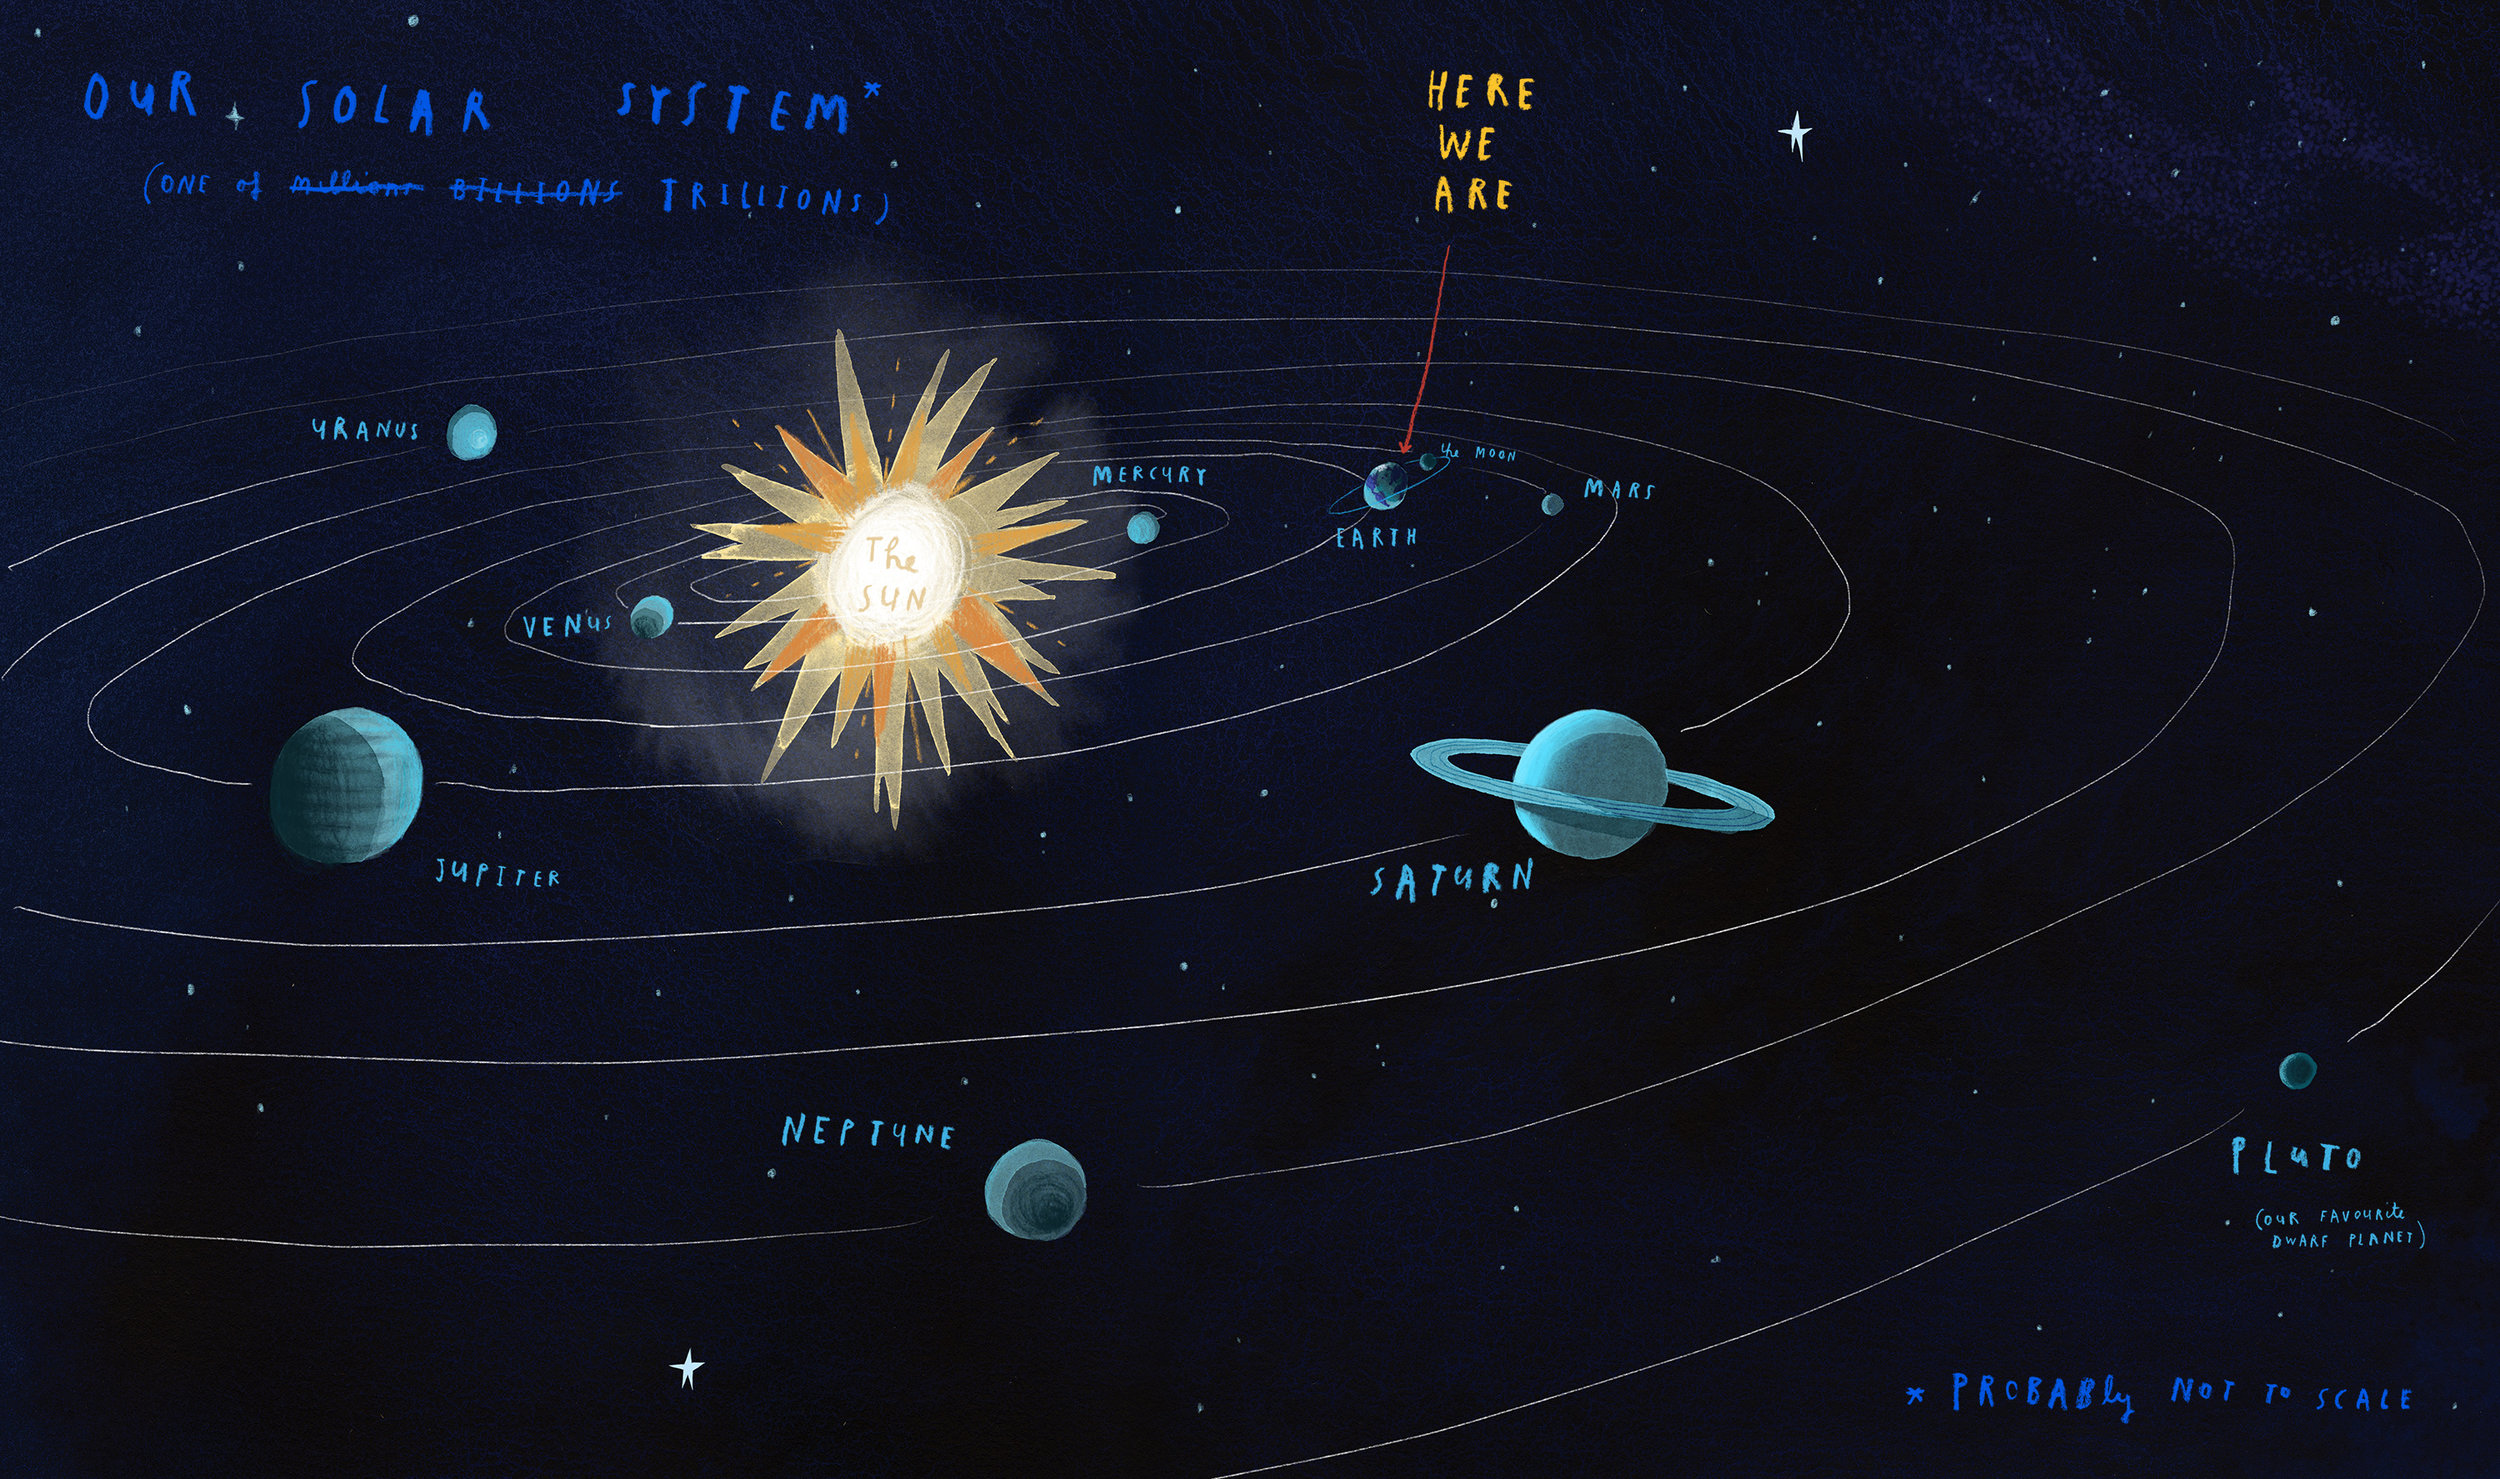 06_07_solarsystem_300dpi_F.jpg